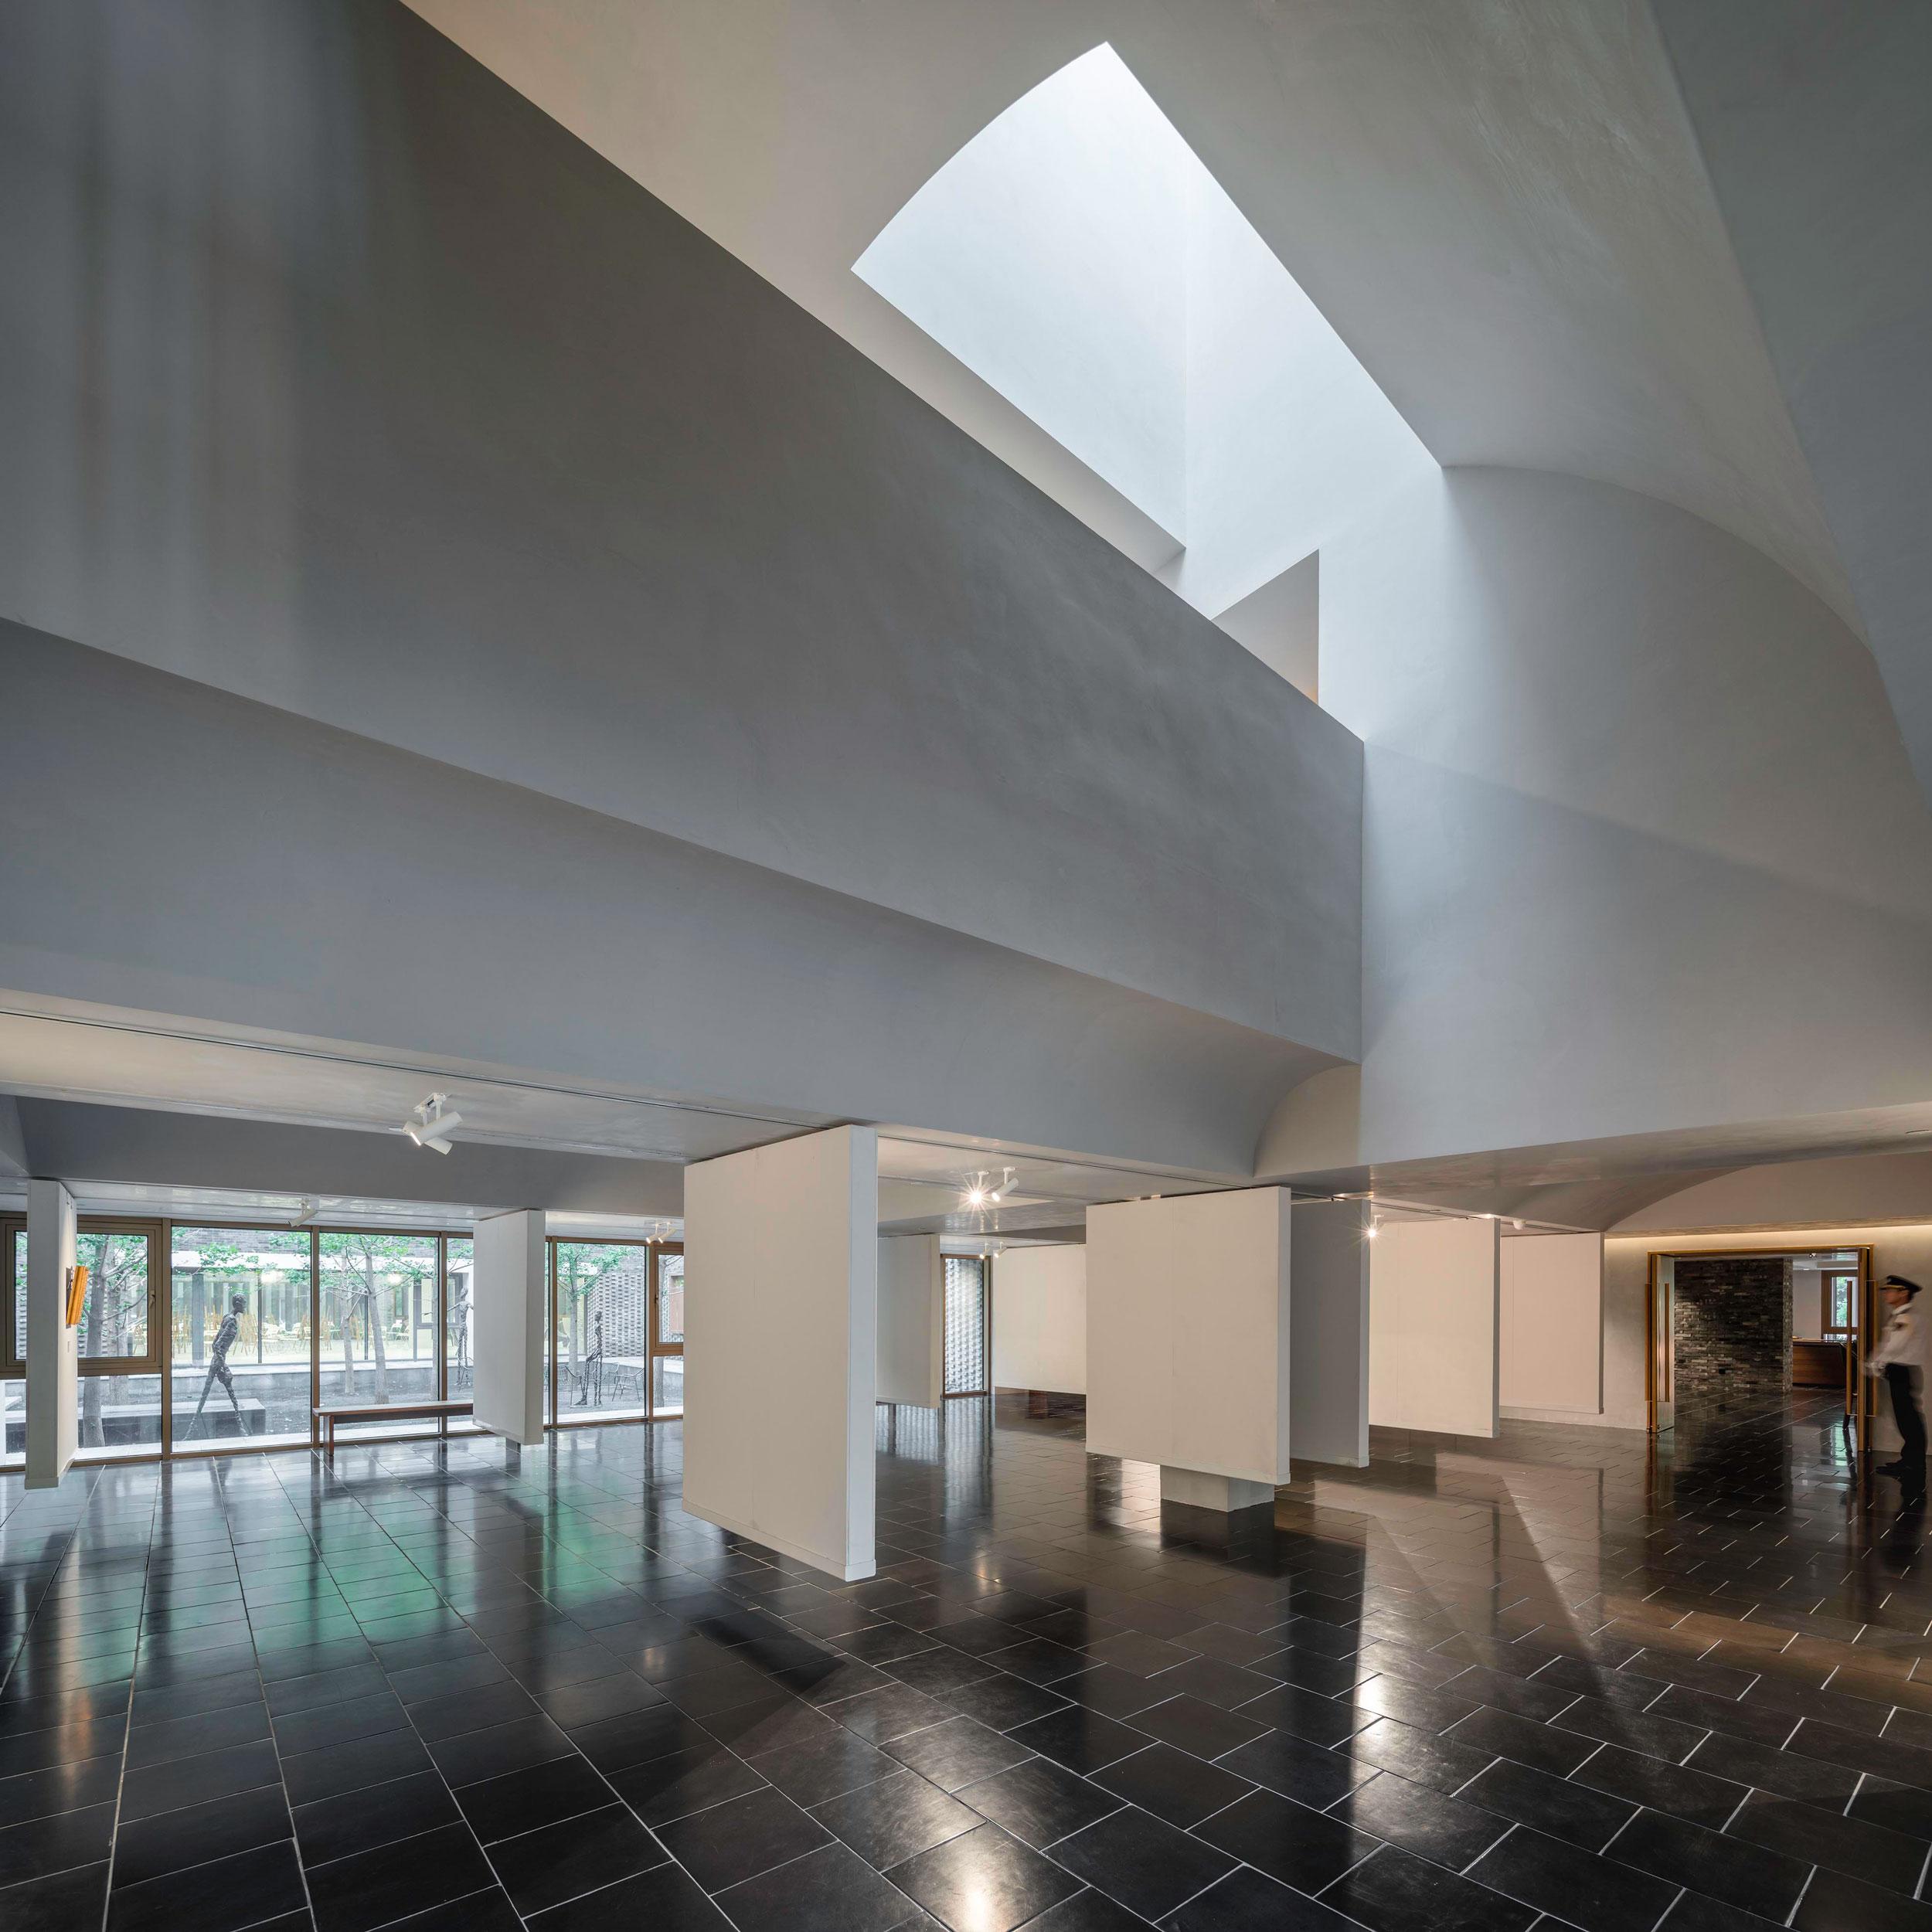 Junshan Cultural Center Designed by Neri&Hu Pedro Pegenaute